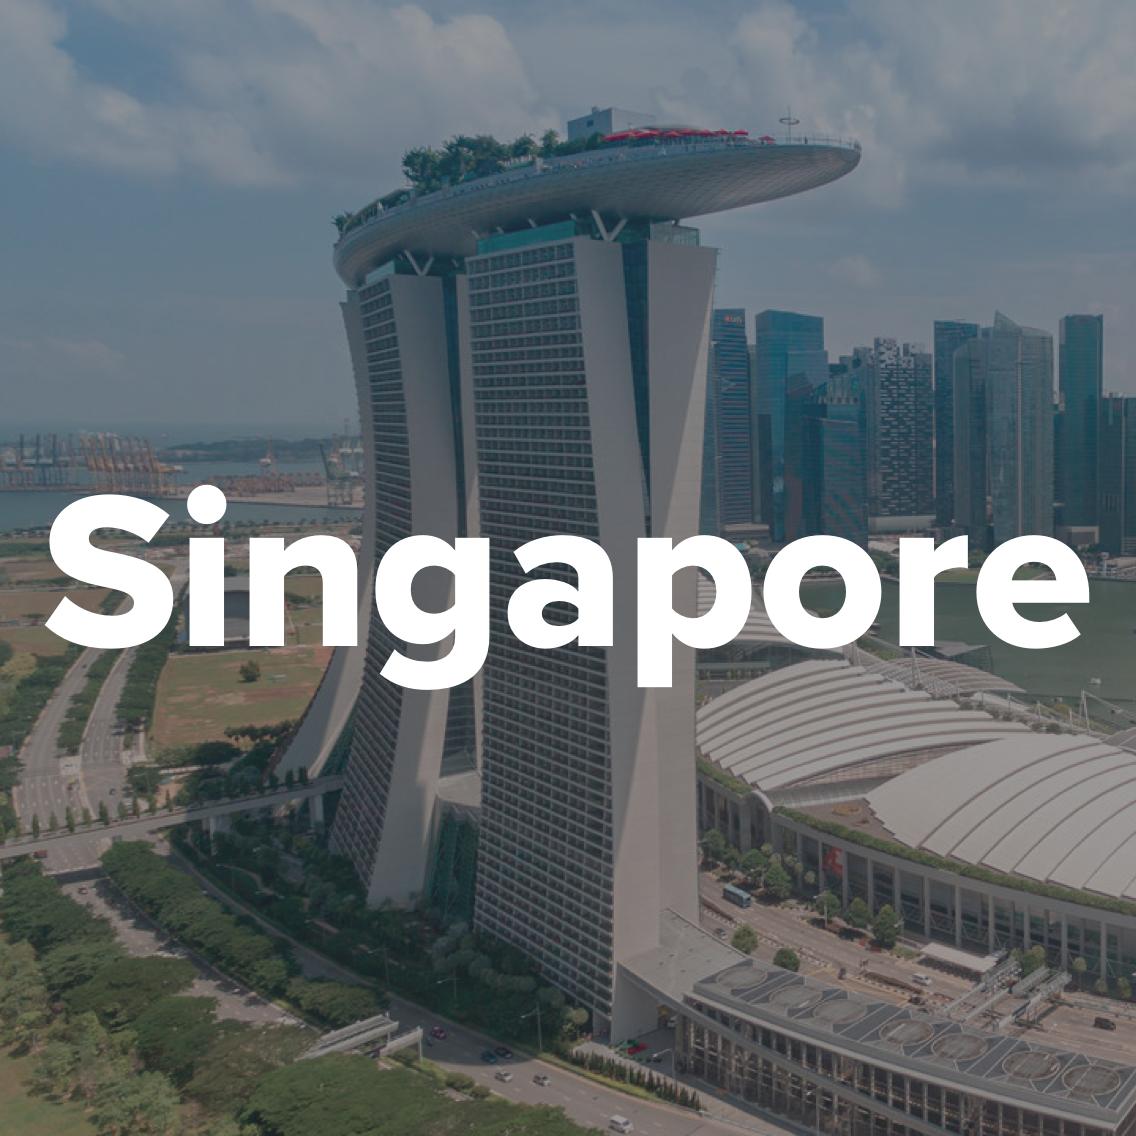 connect-roadshow-website-image-2020 - Singapore